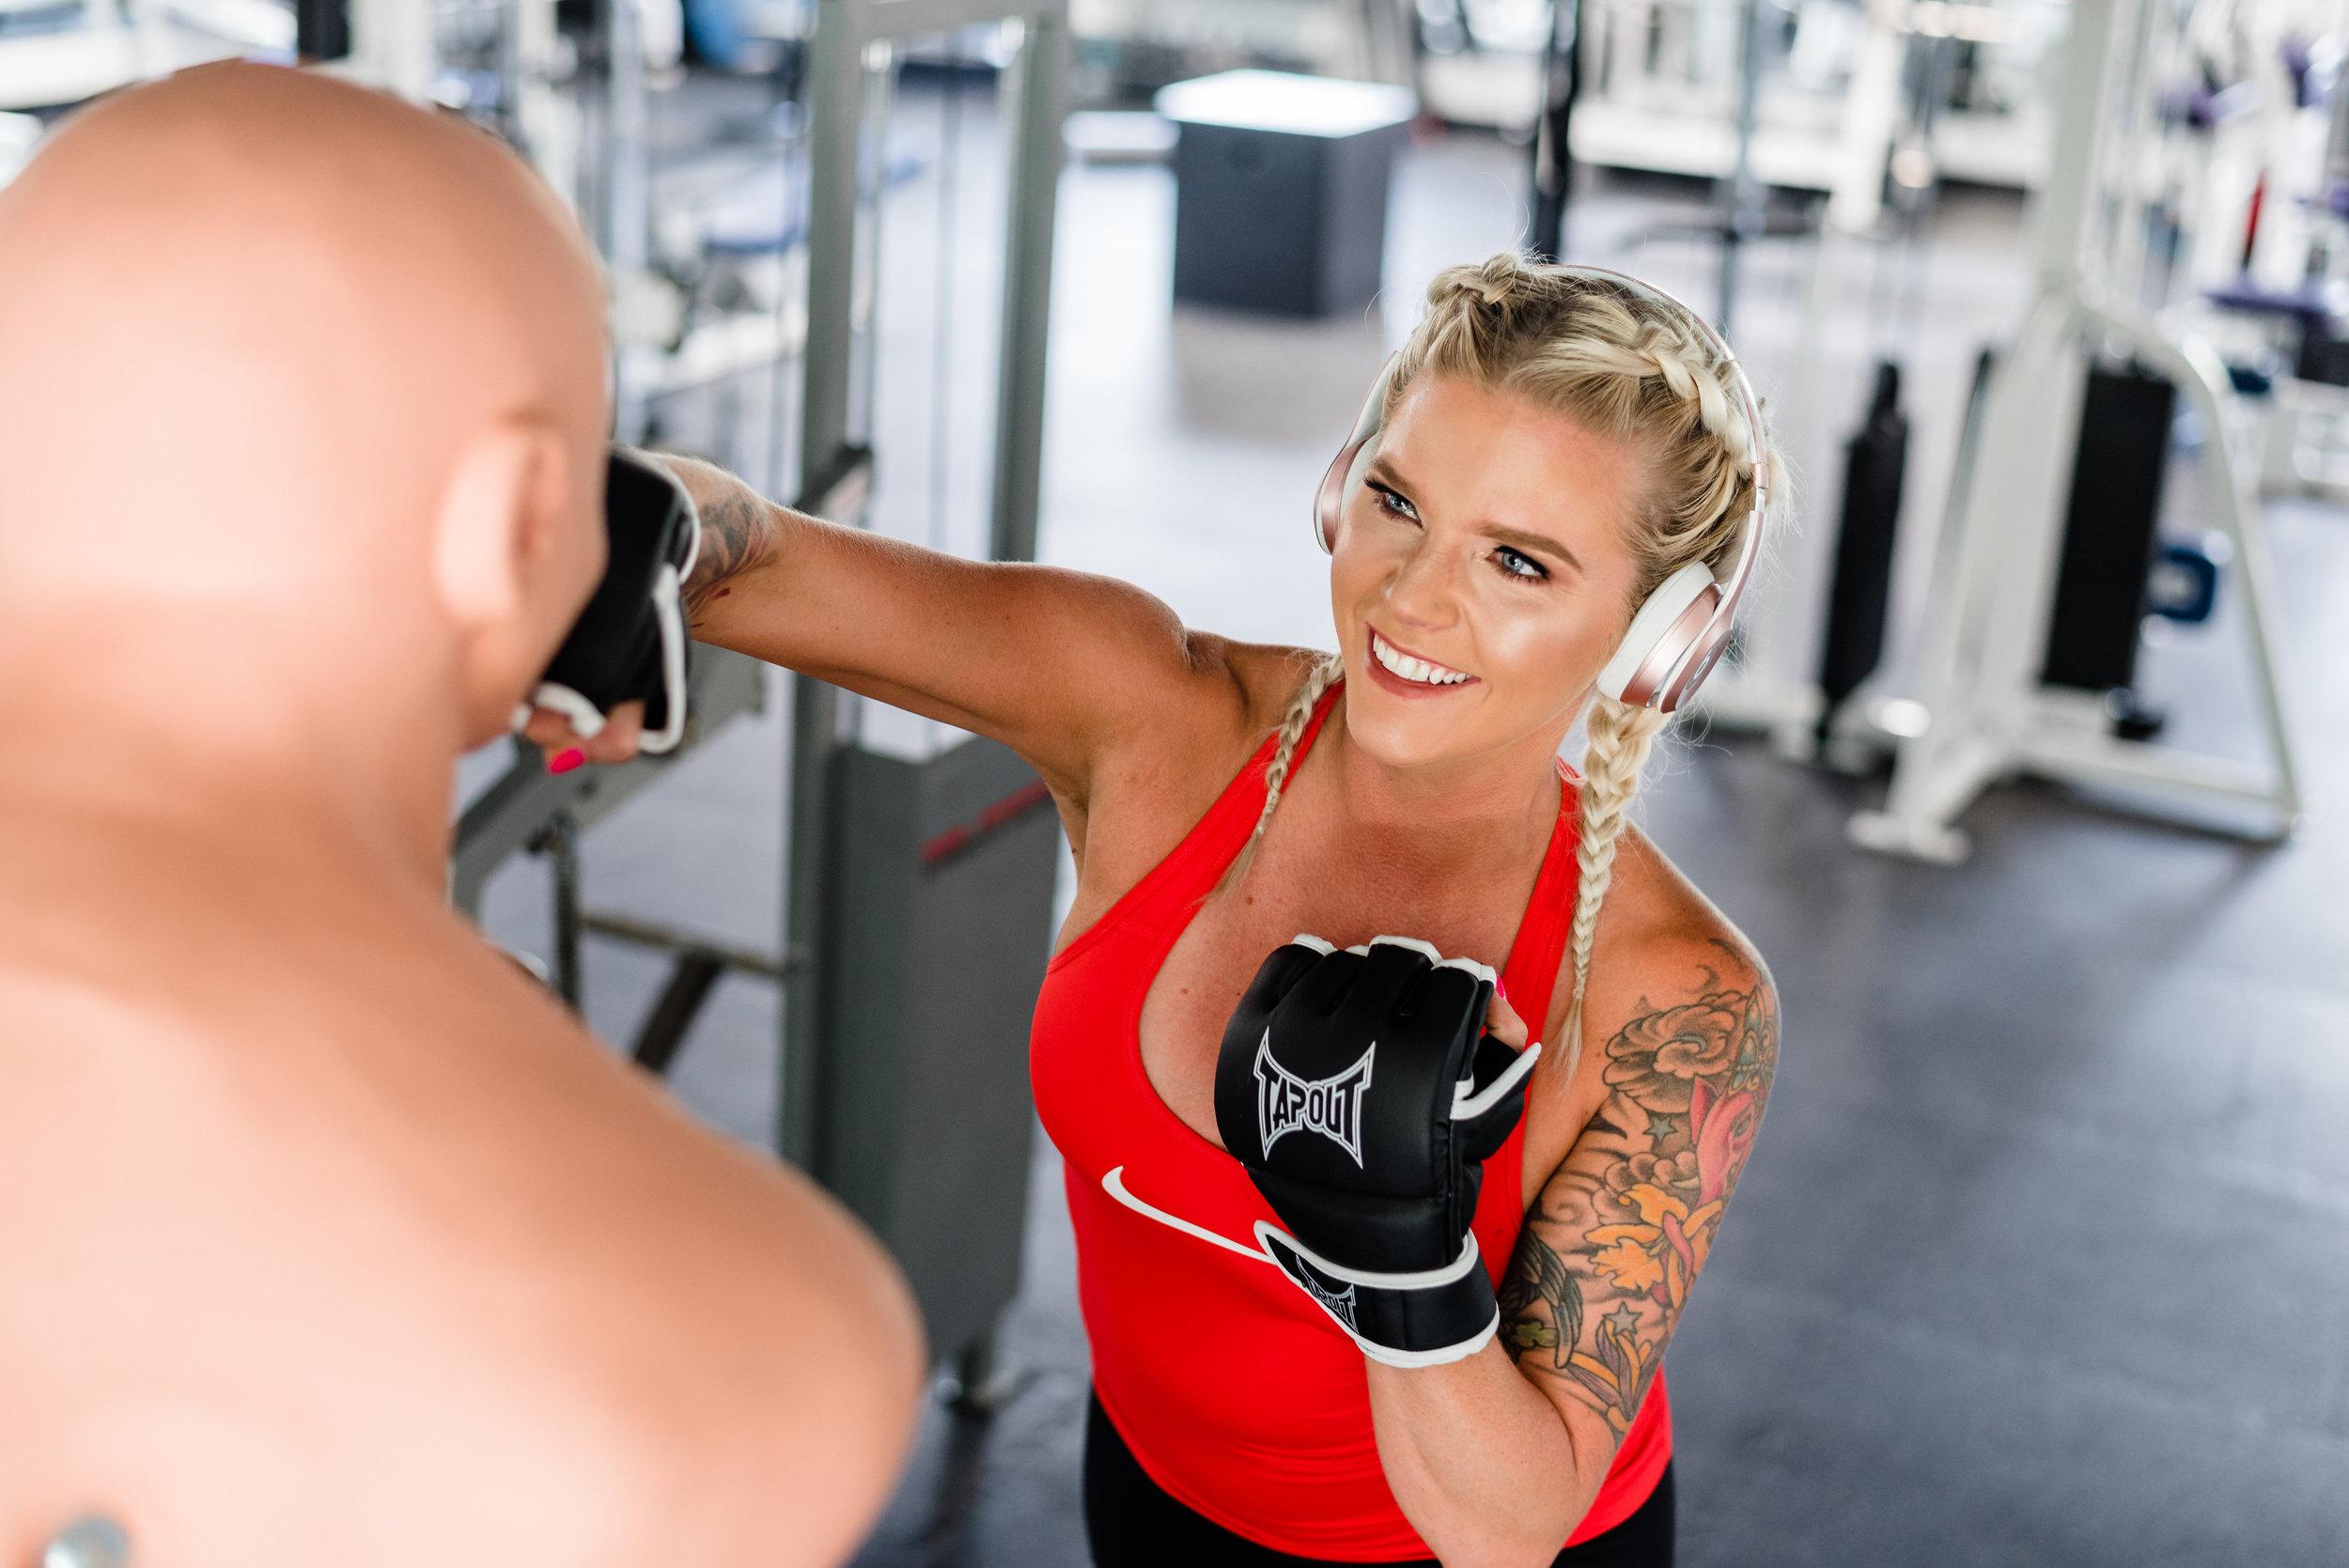 Lisa_workout-22.jpg